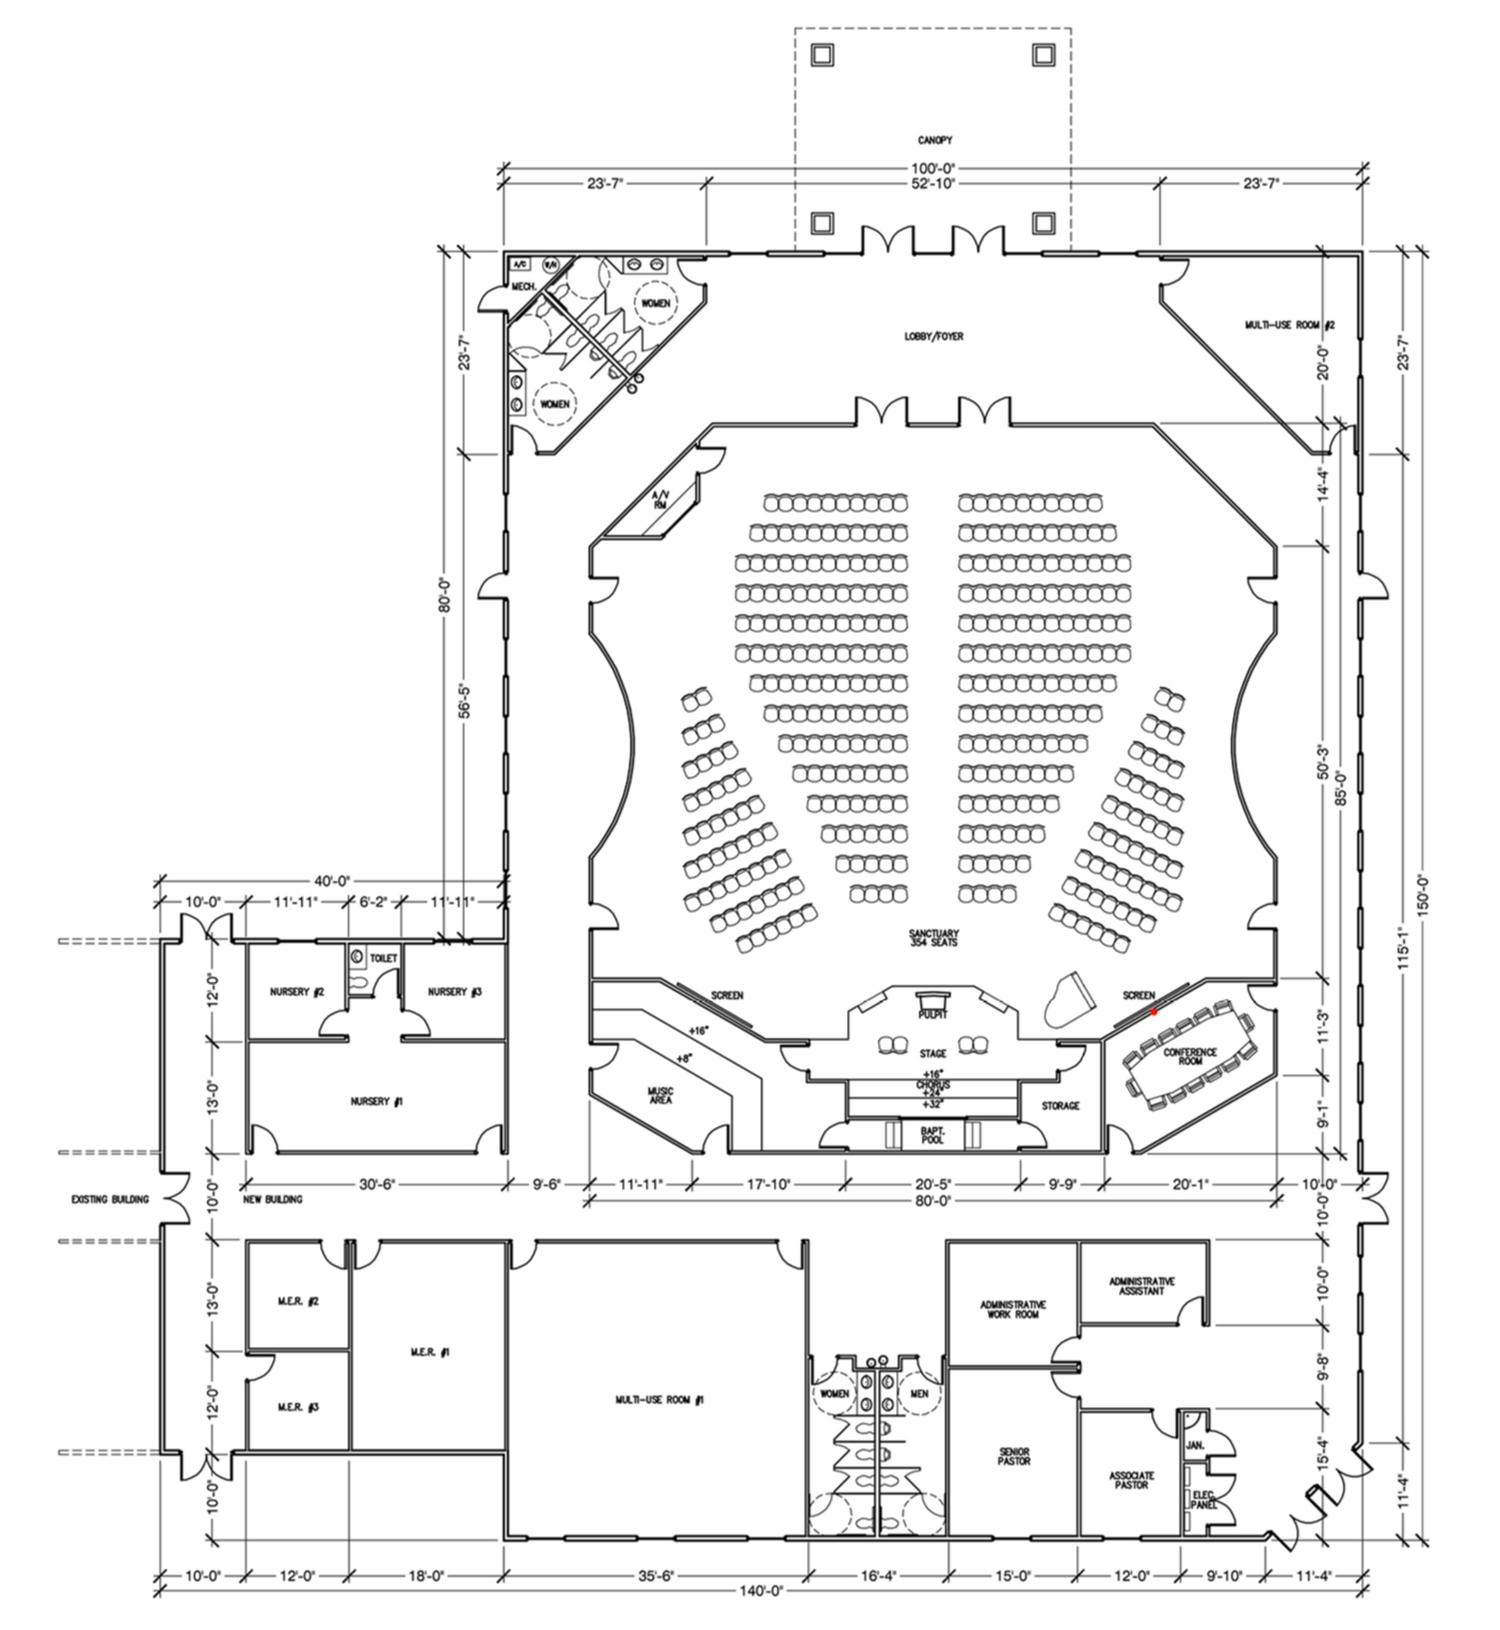 Easy Line Plan Of School Easy Building